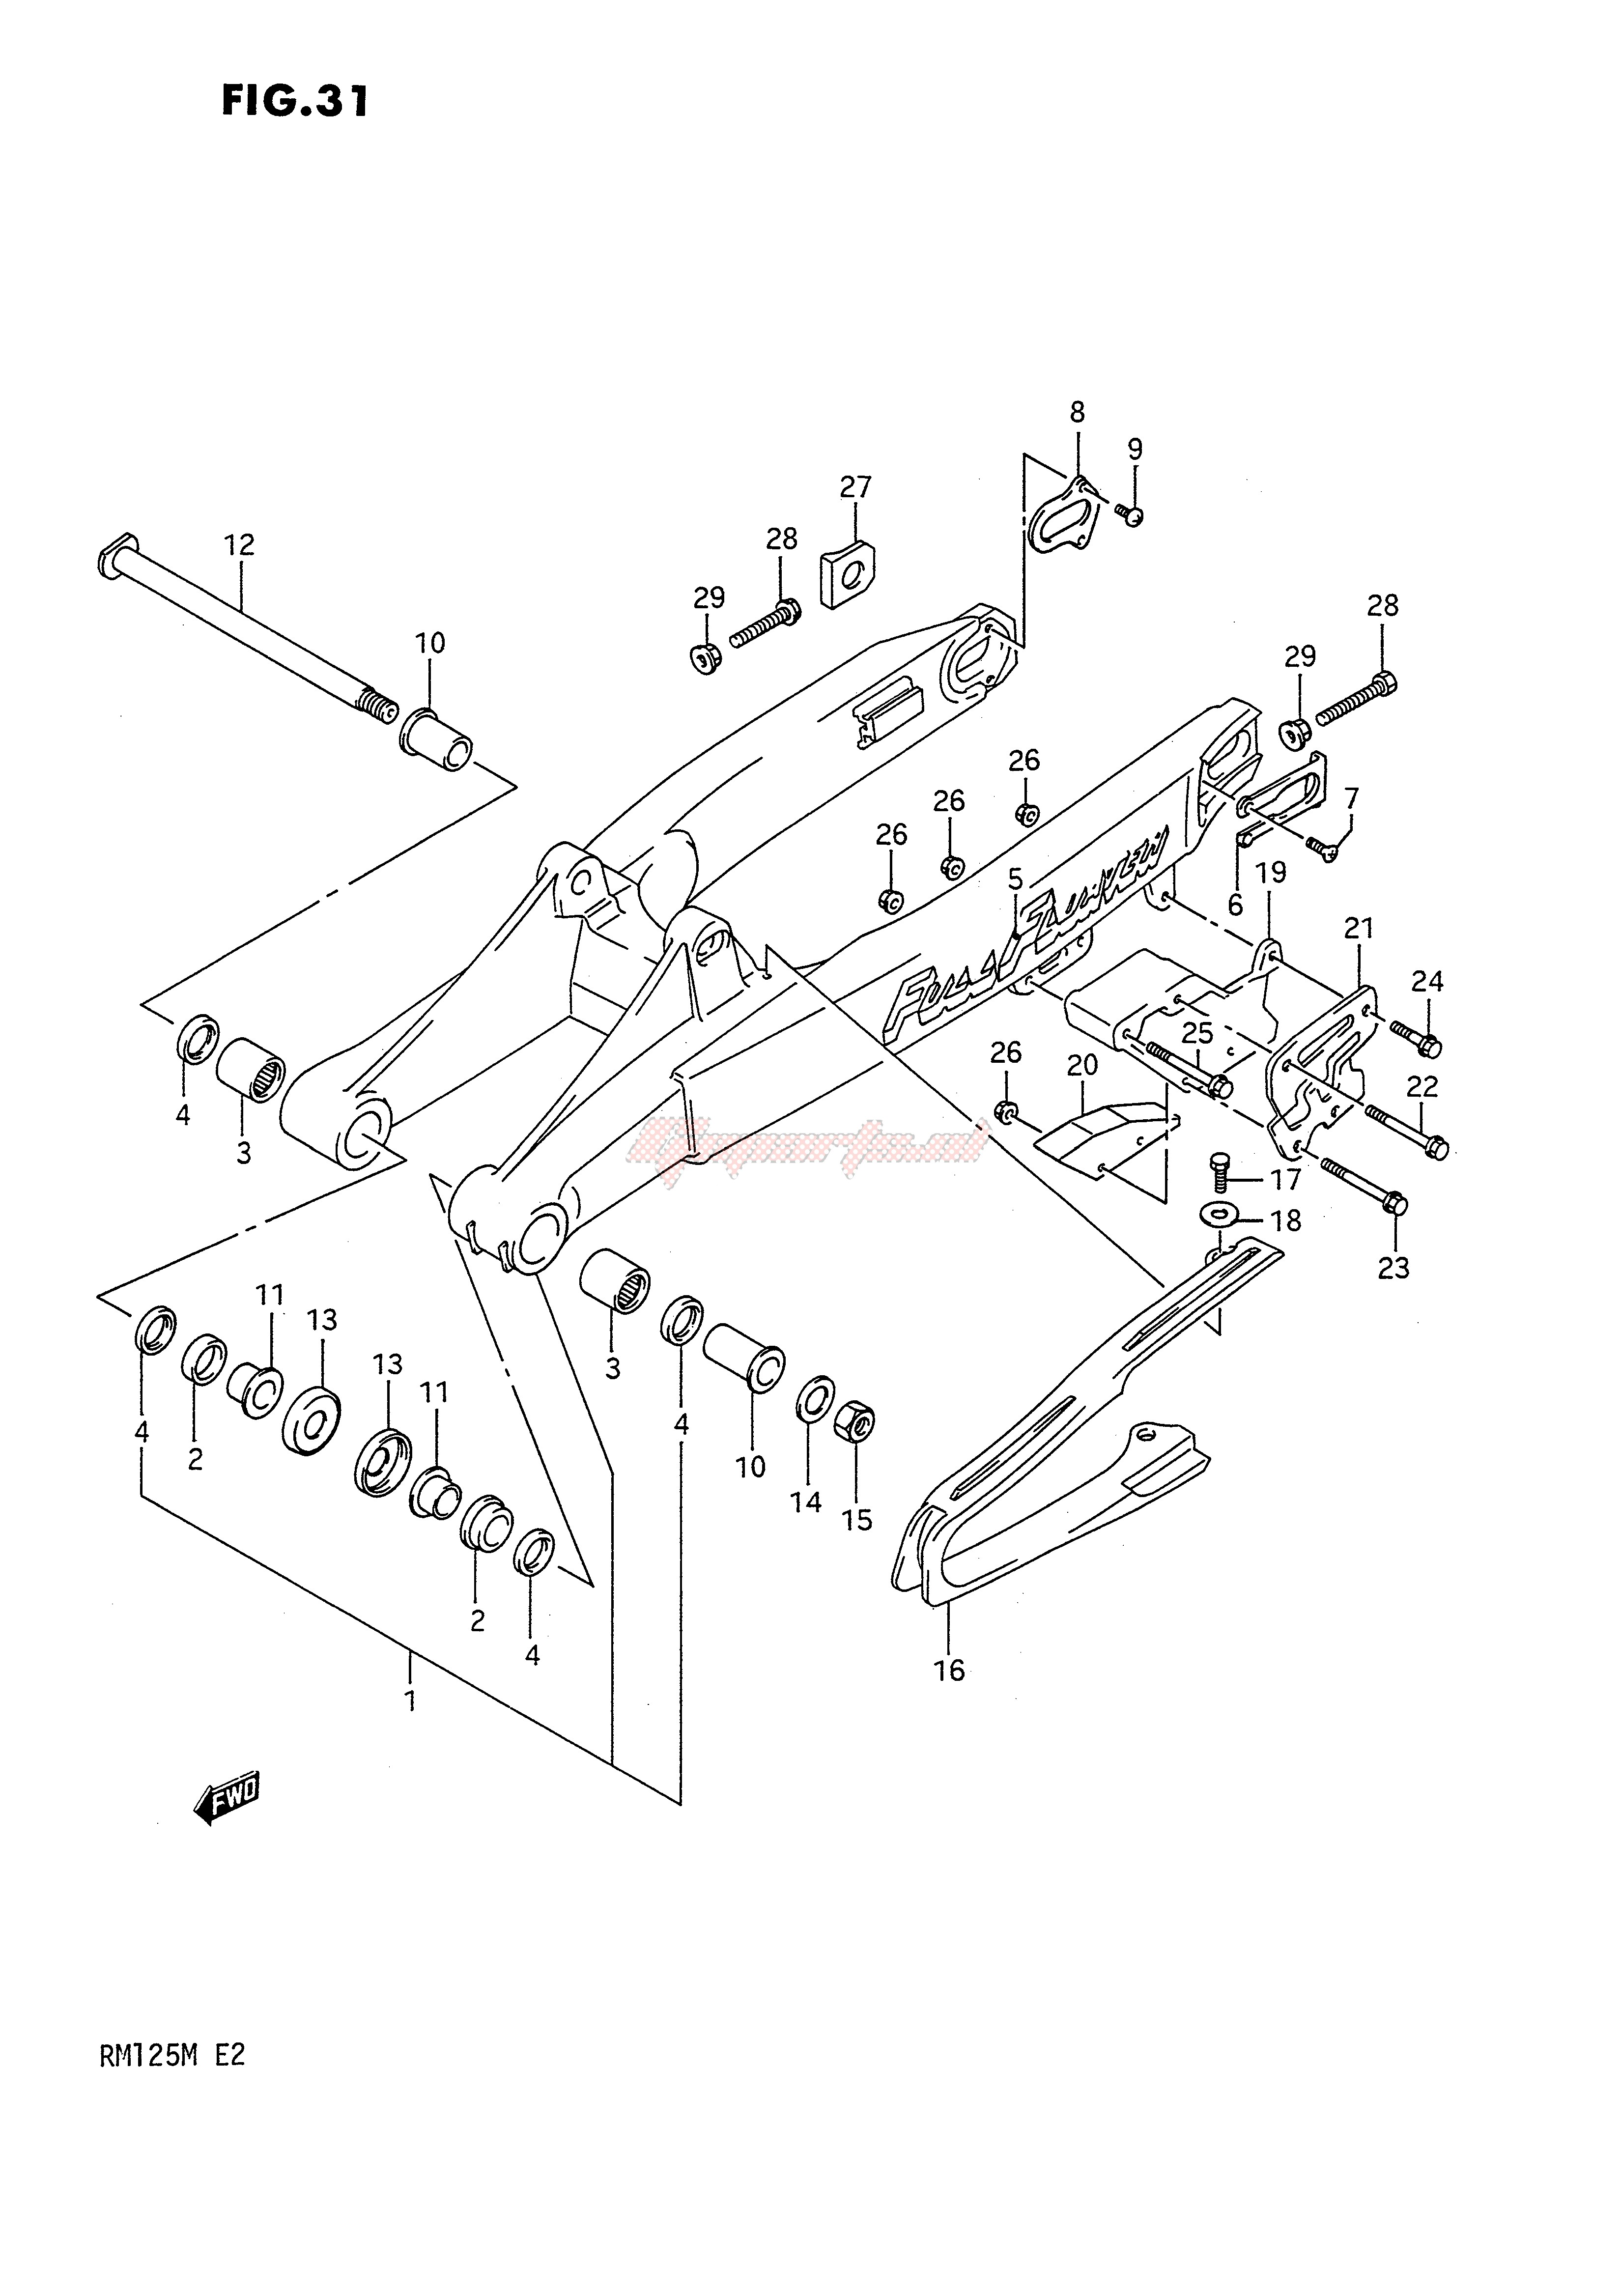 REAR SWINGING ARM (MODEL K) blueprint